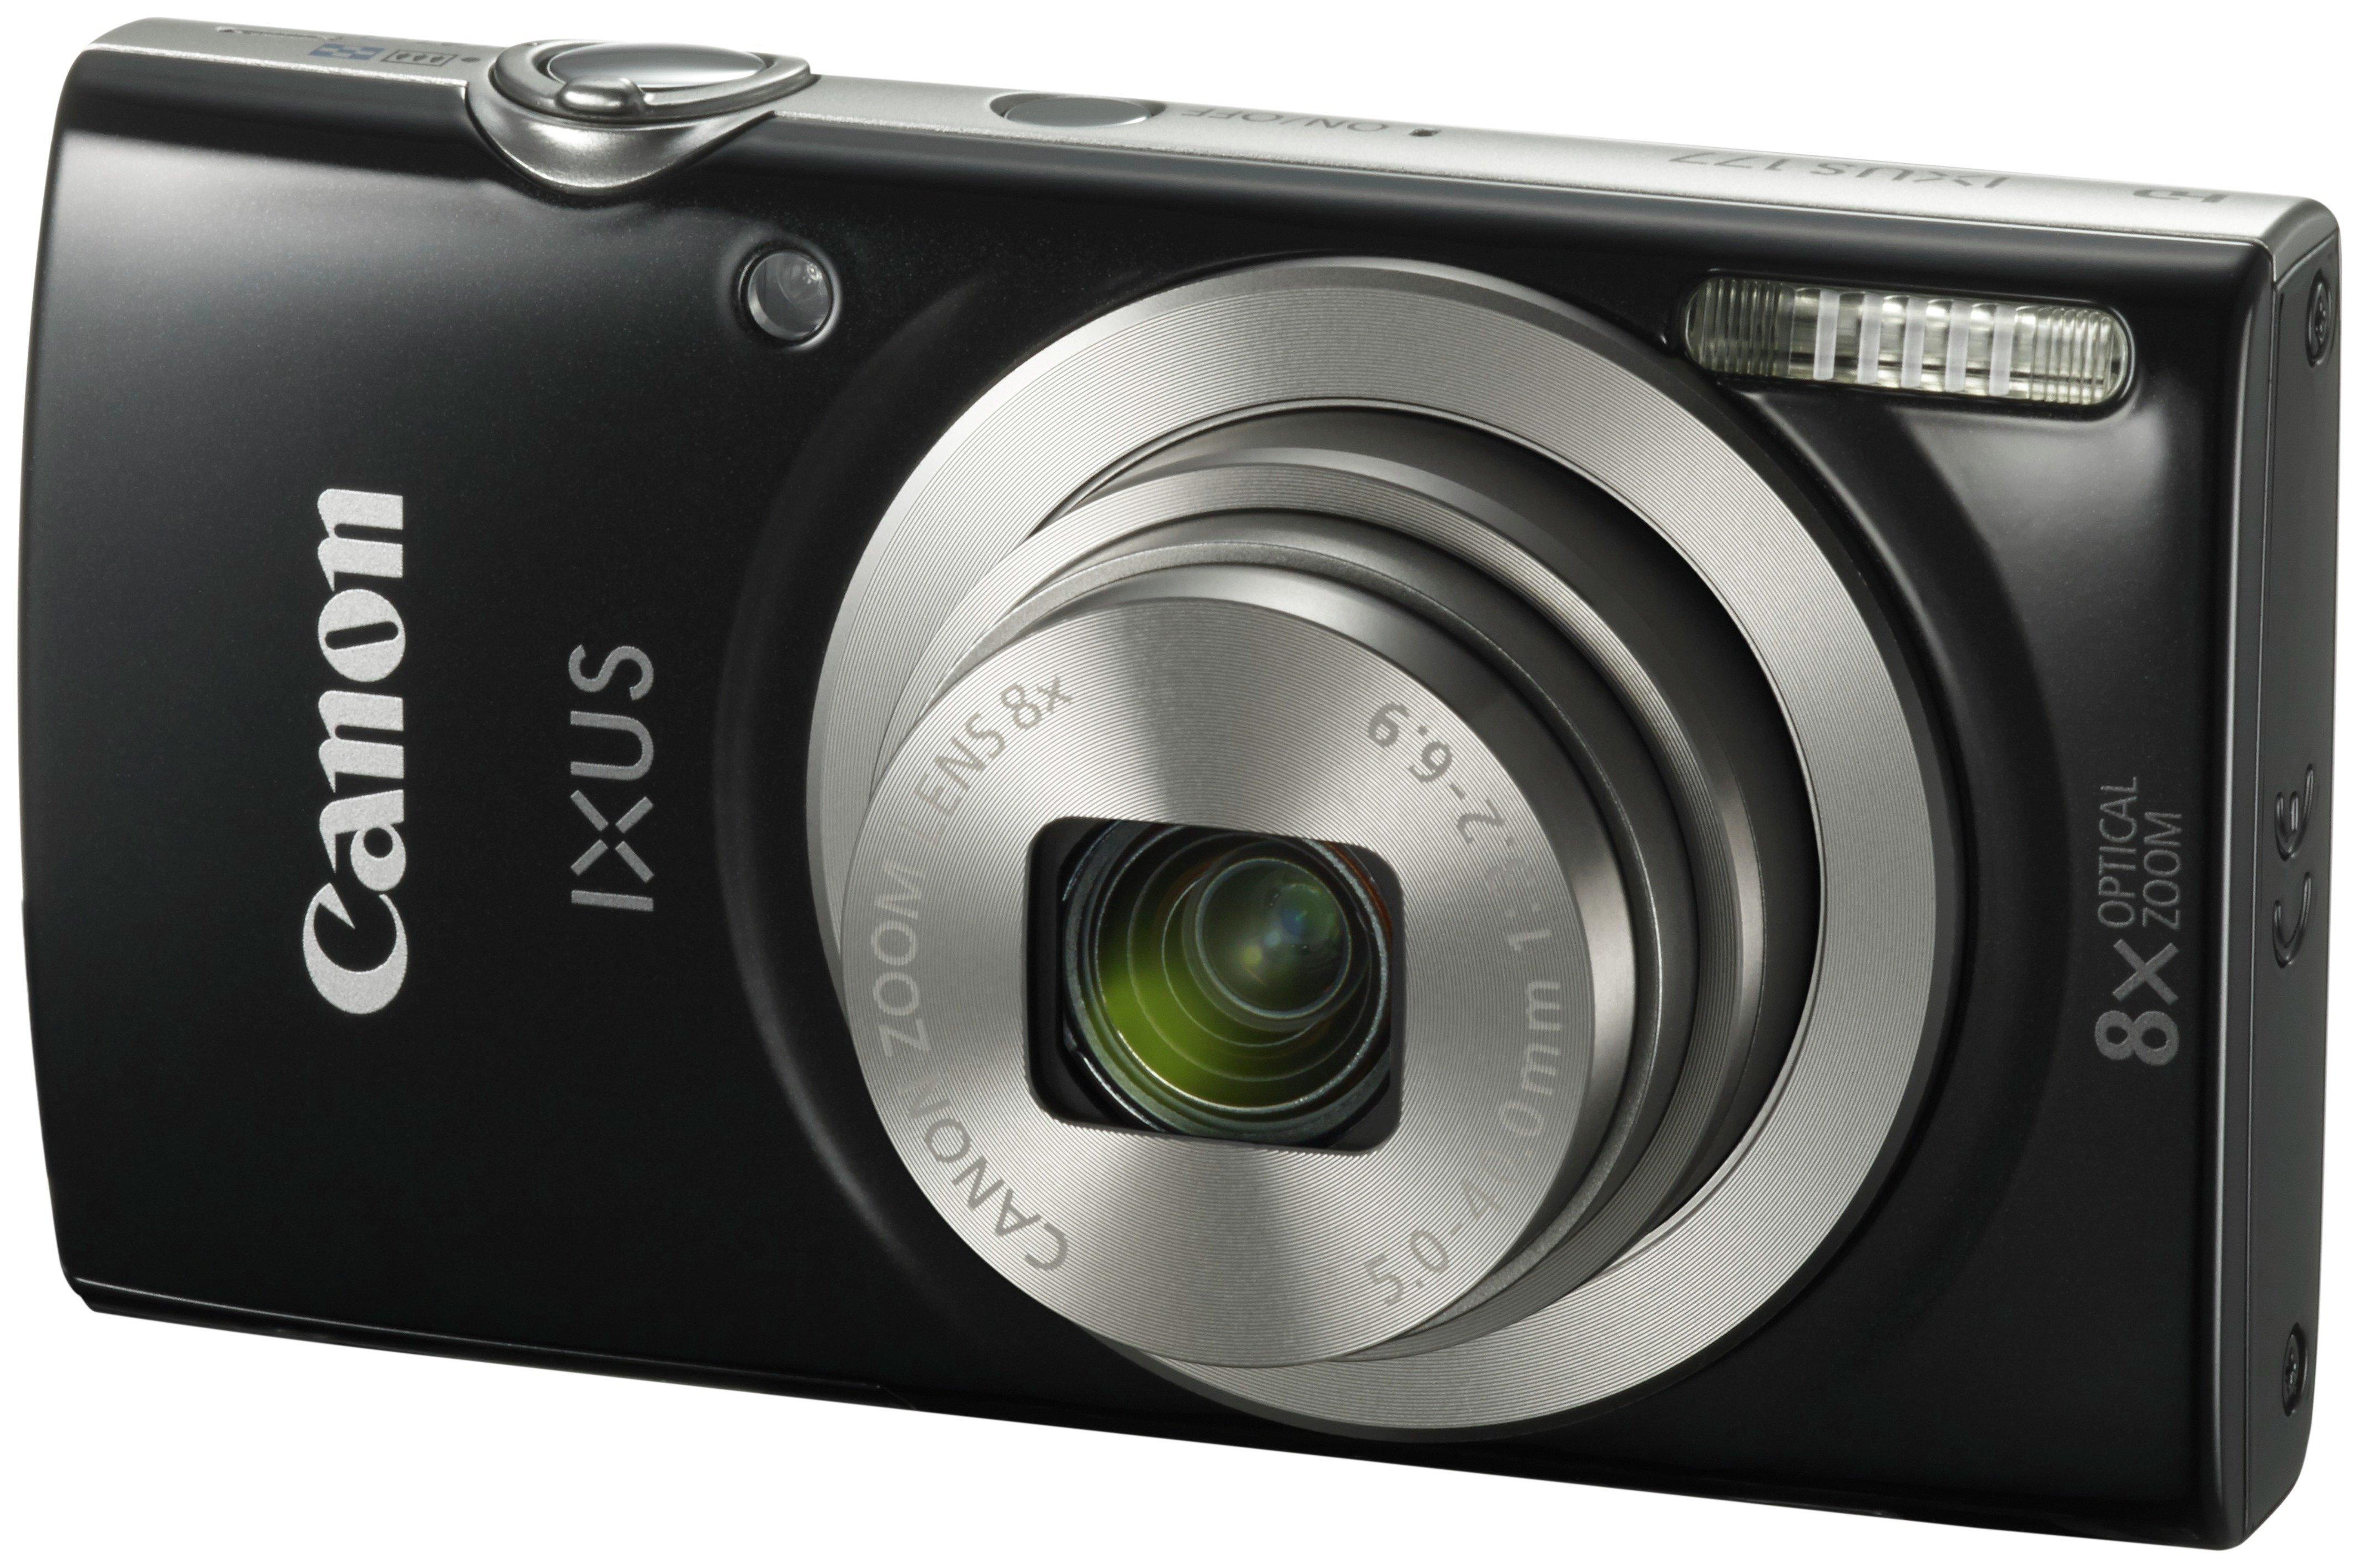 Camera Argos Dslr Cameras buy canon ixus 177 20mp 8x zoom compact digital camera black at argos co uk your online shop for cameras came